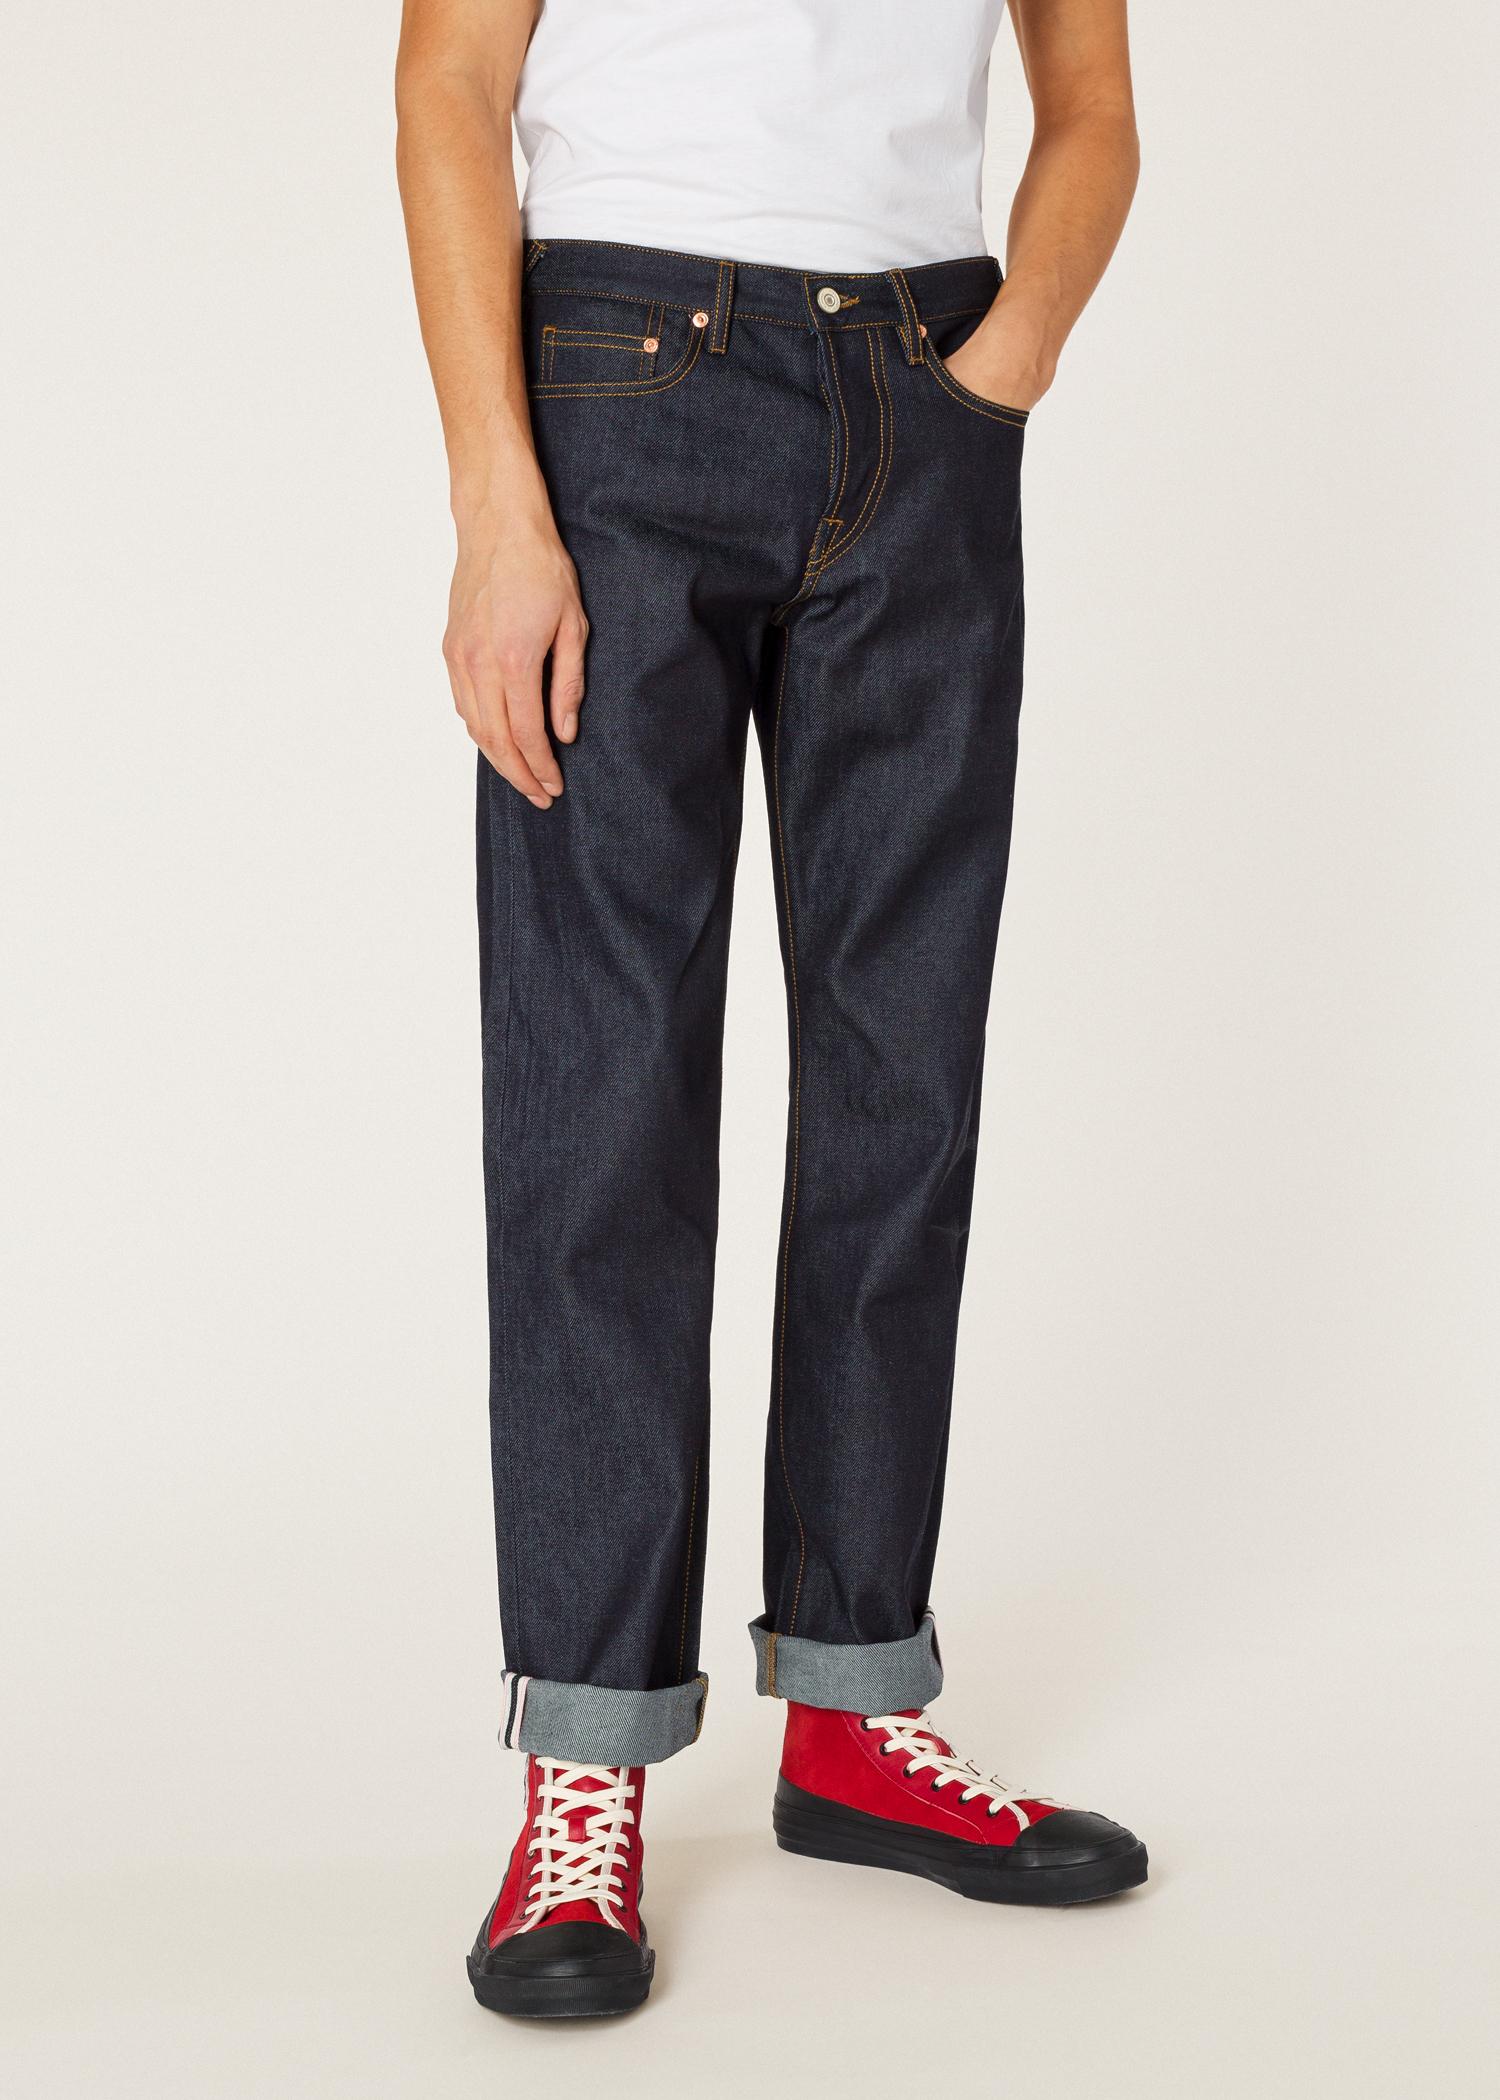 acbb8fcd1c5 Men s Standard-Fit  Pink Selvedge  Raw Denim Jeans .